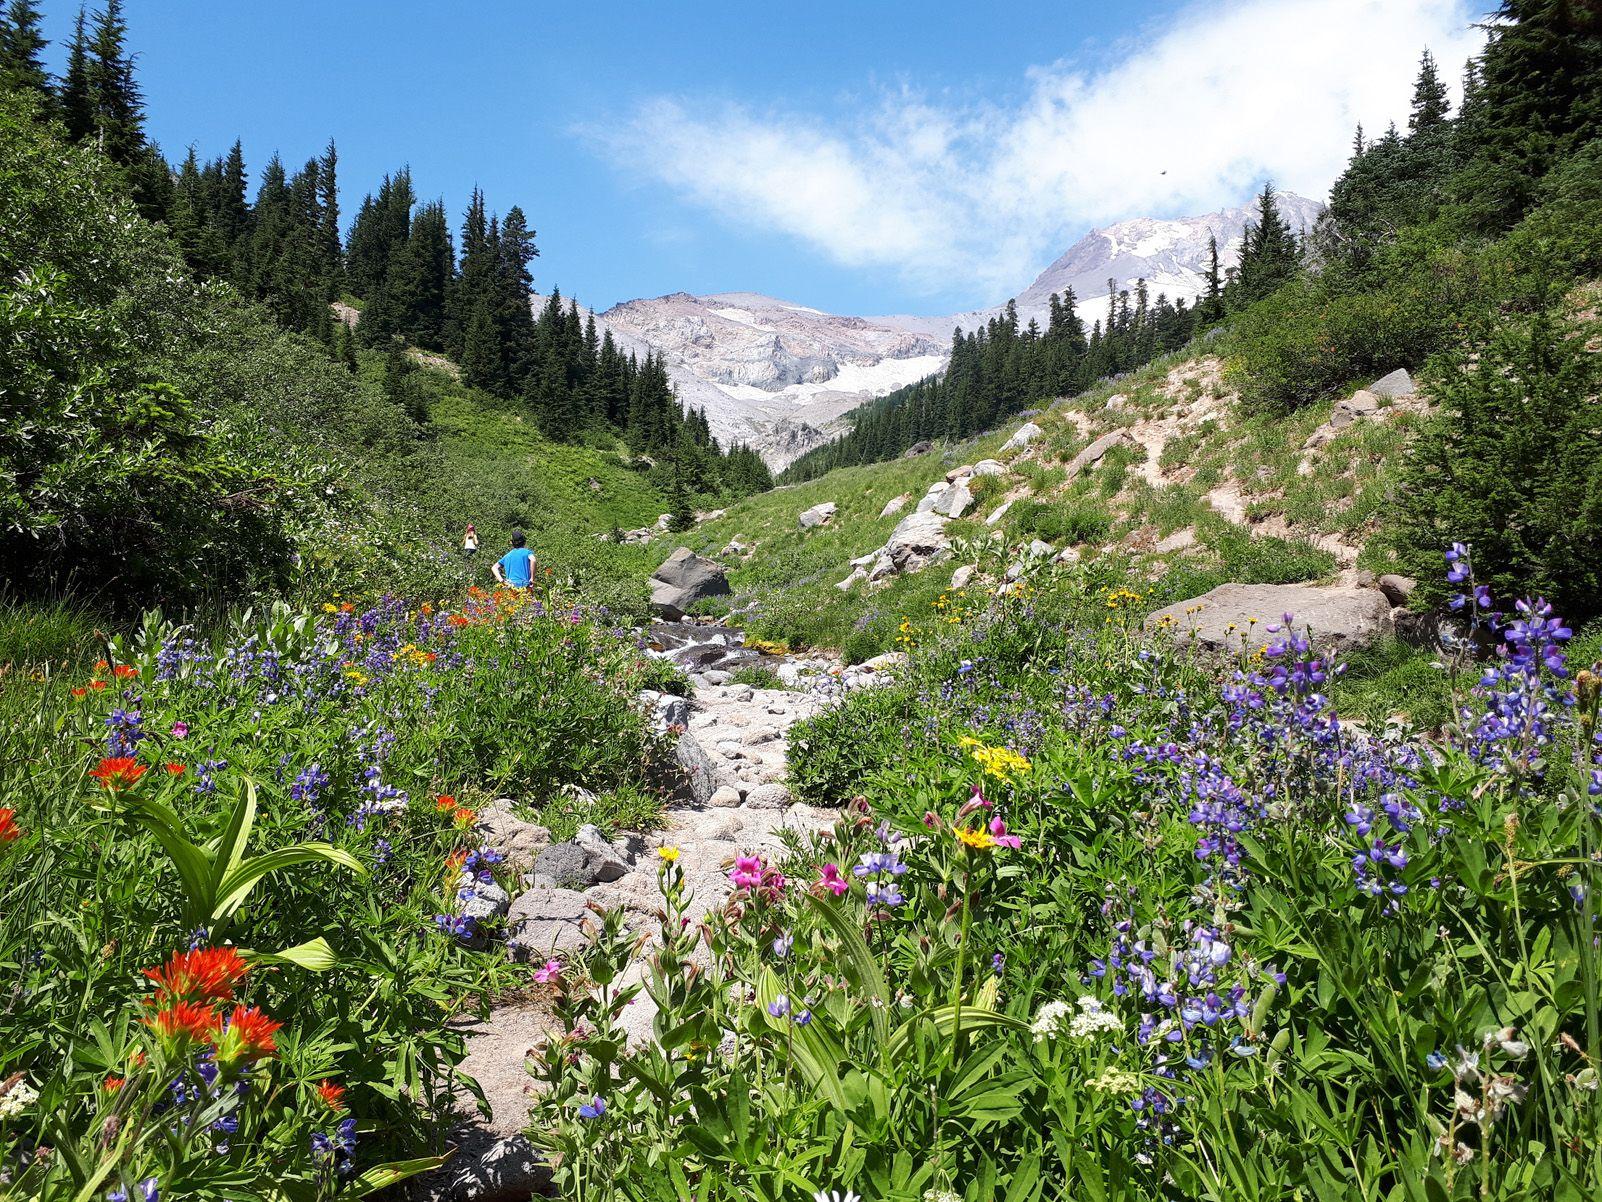 Toni Izquierdo Alsina   Una caminata colorida   Mount Hood, Oregon, EEUU